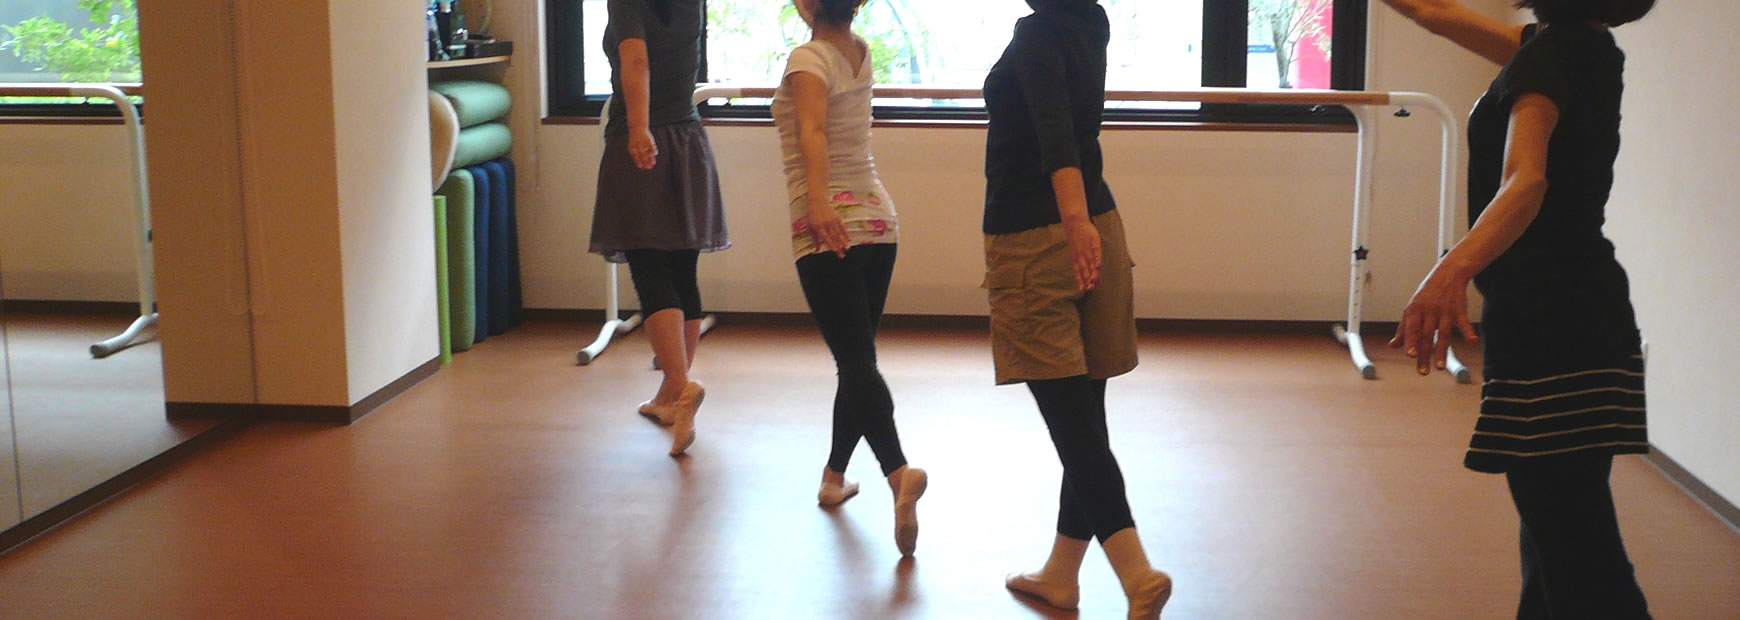 ballet_image001